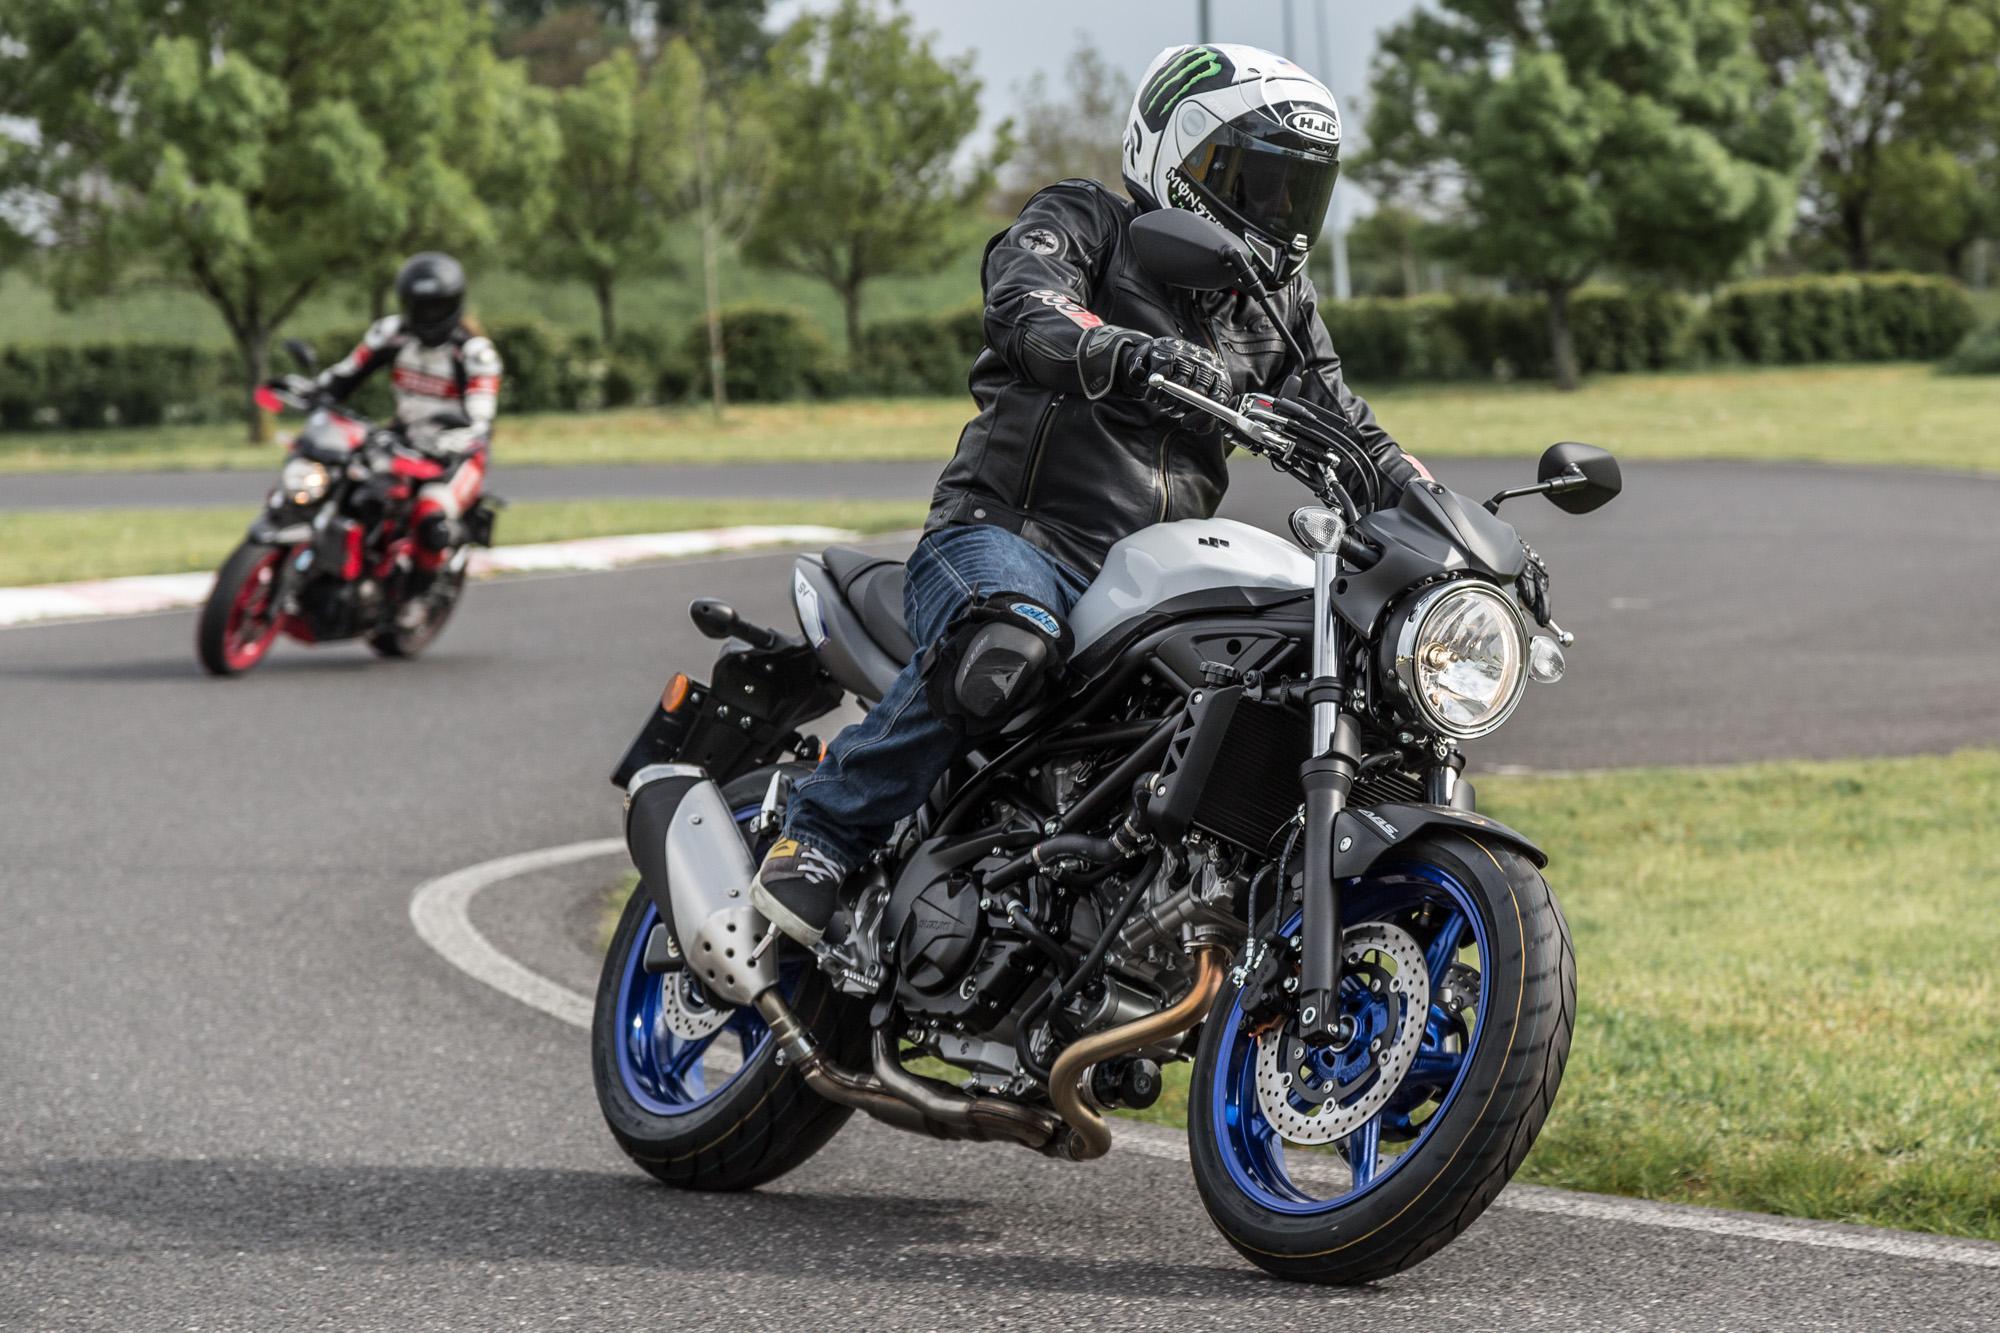 Einsteiger Nakedbikes 2016: Yamaha MT-07, Honda CB650F & Suzuki SV650 Foto